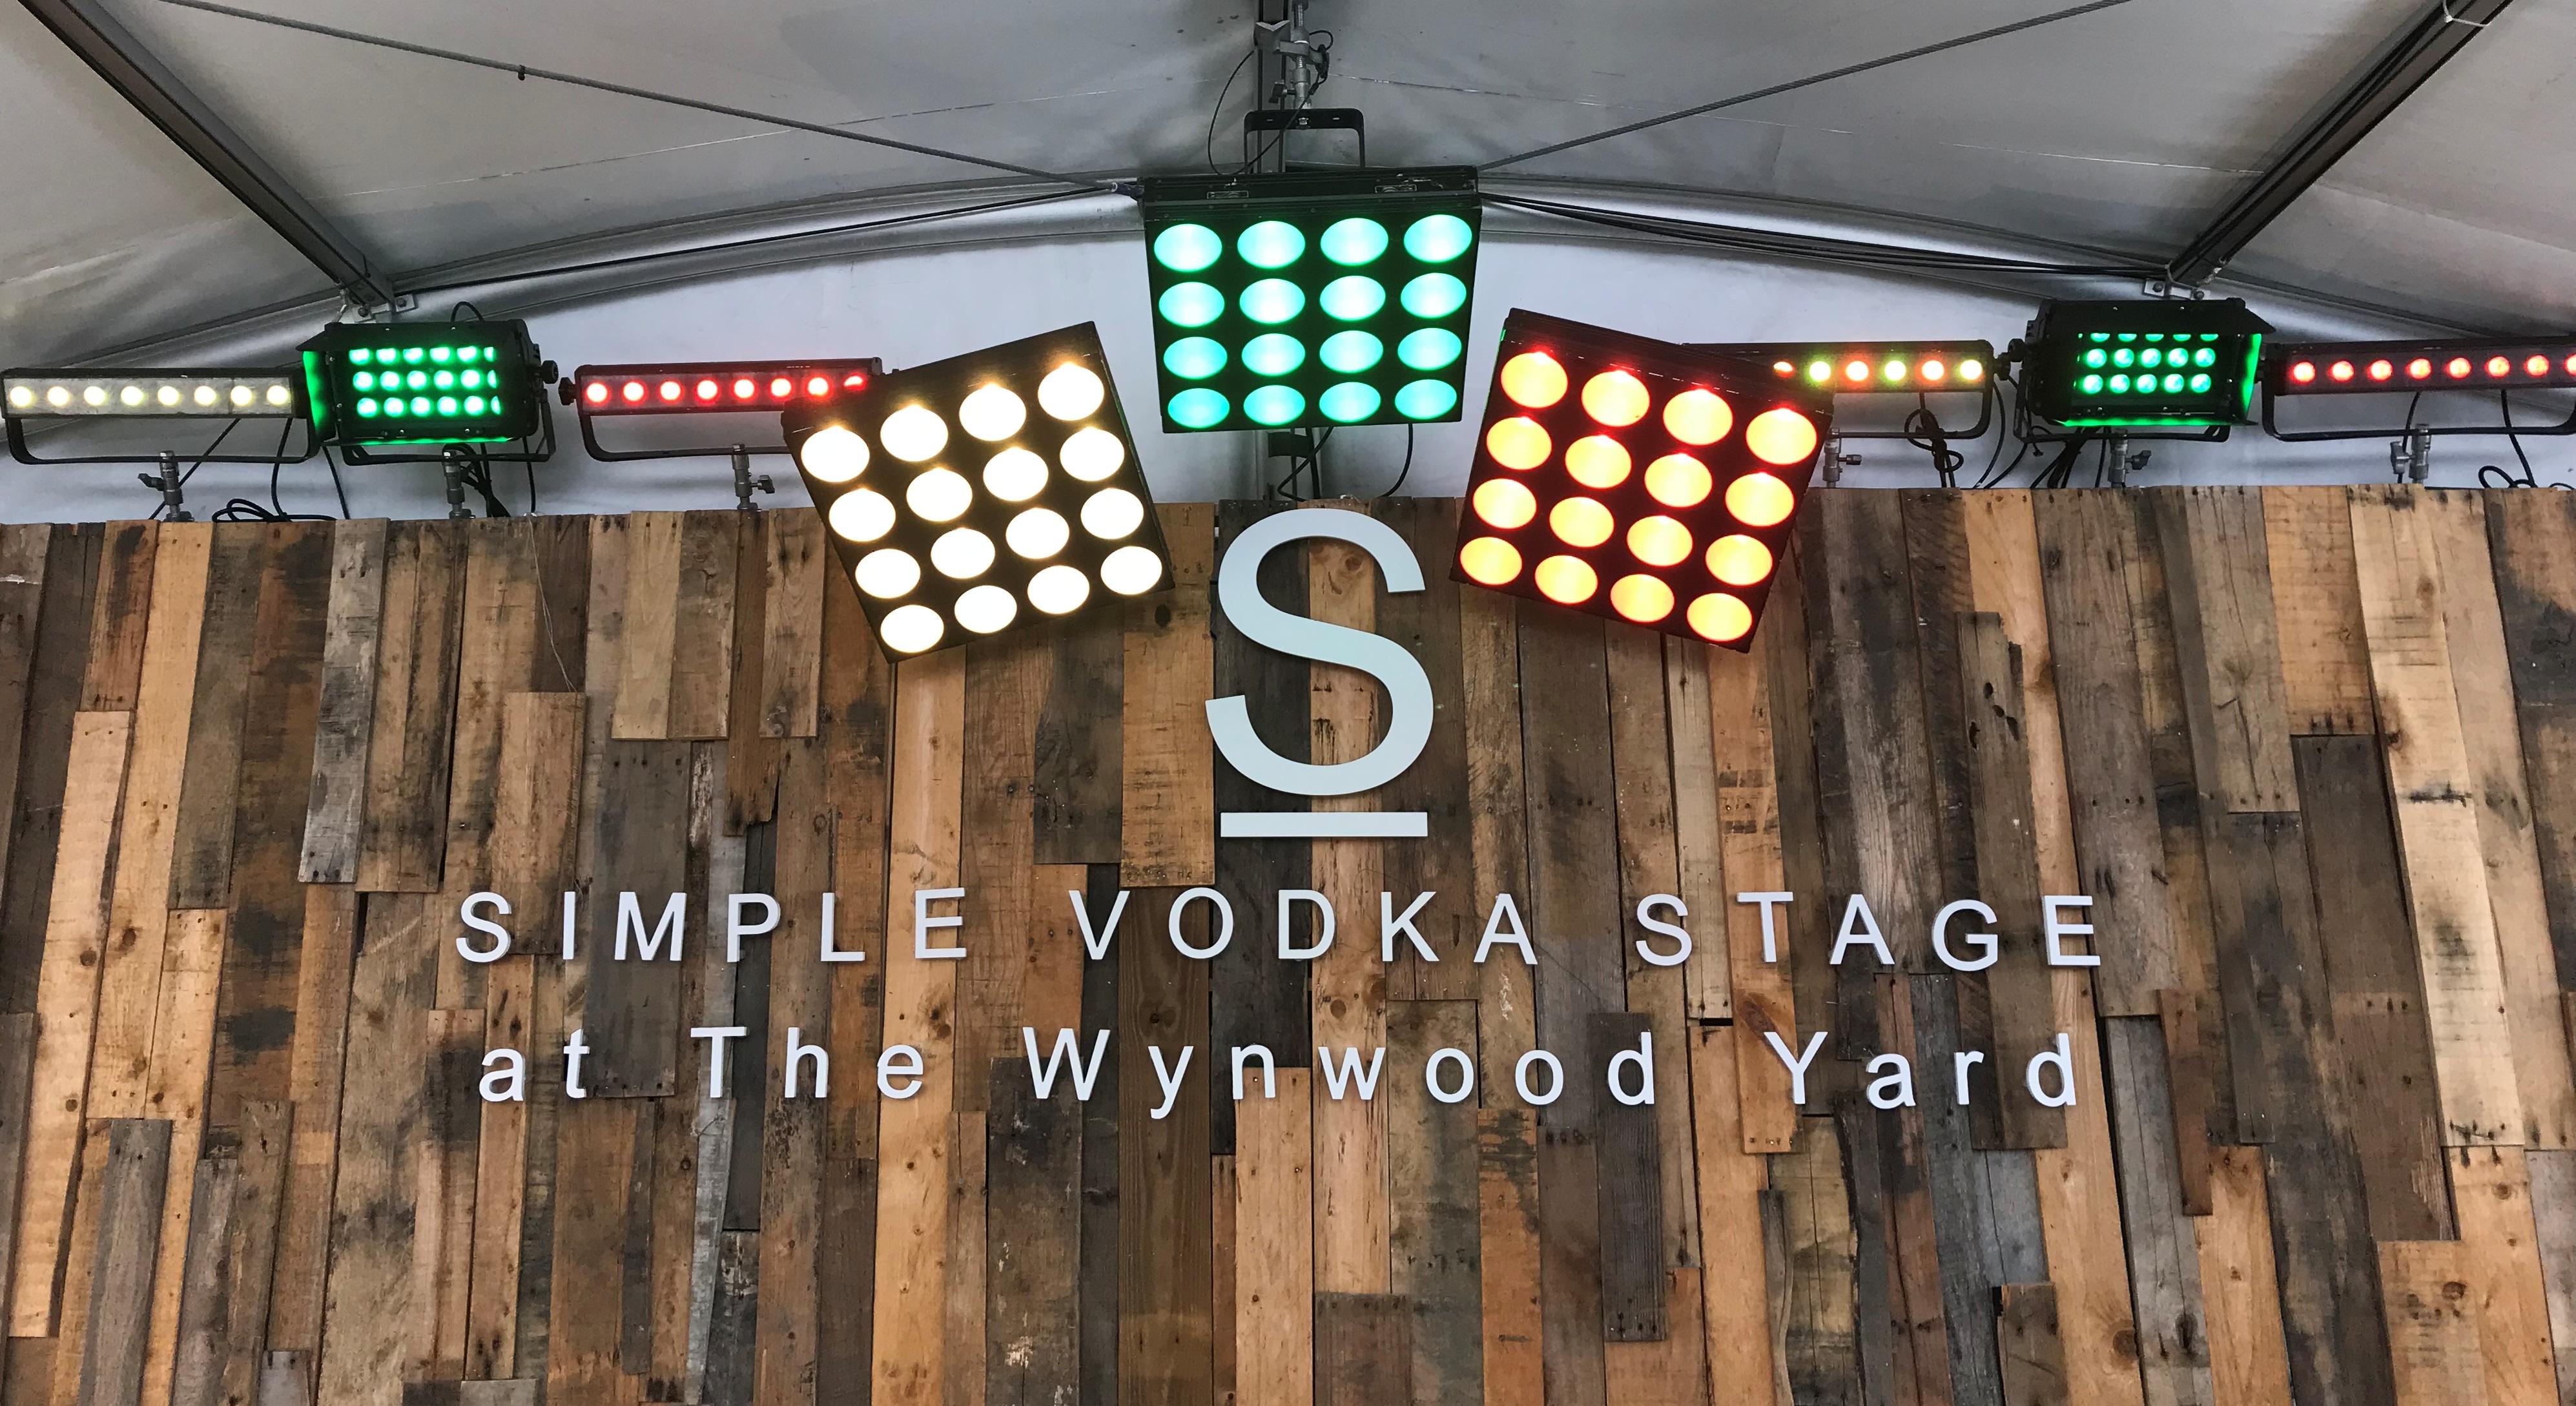 Lighting, corporate branding, Simple Vodka at The Wynwood Yard, Miami, FL